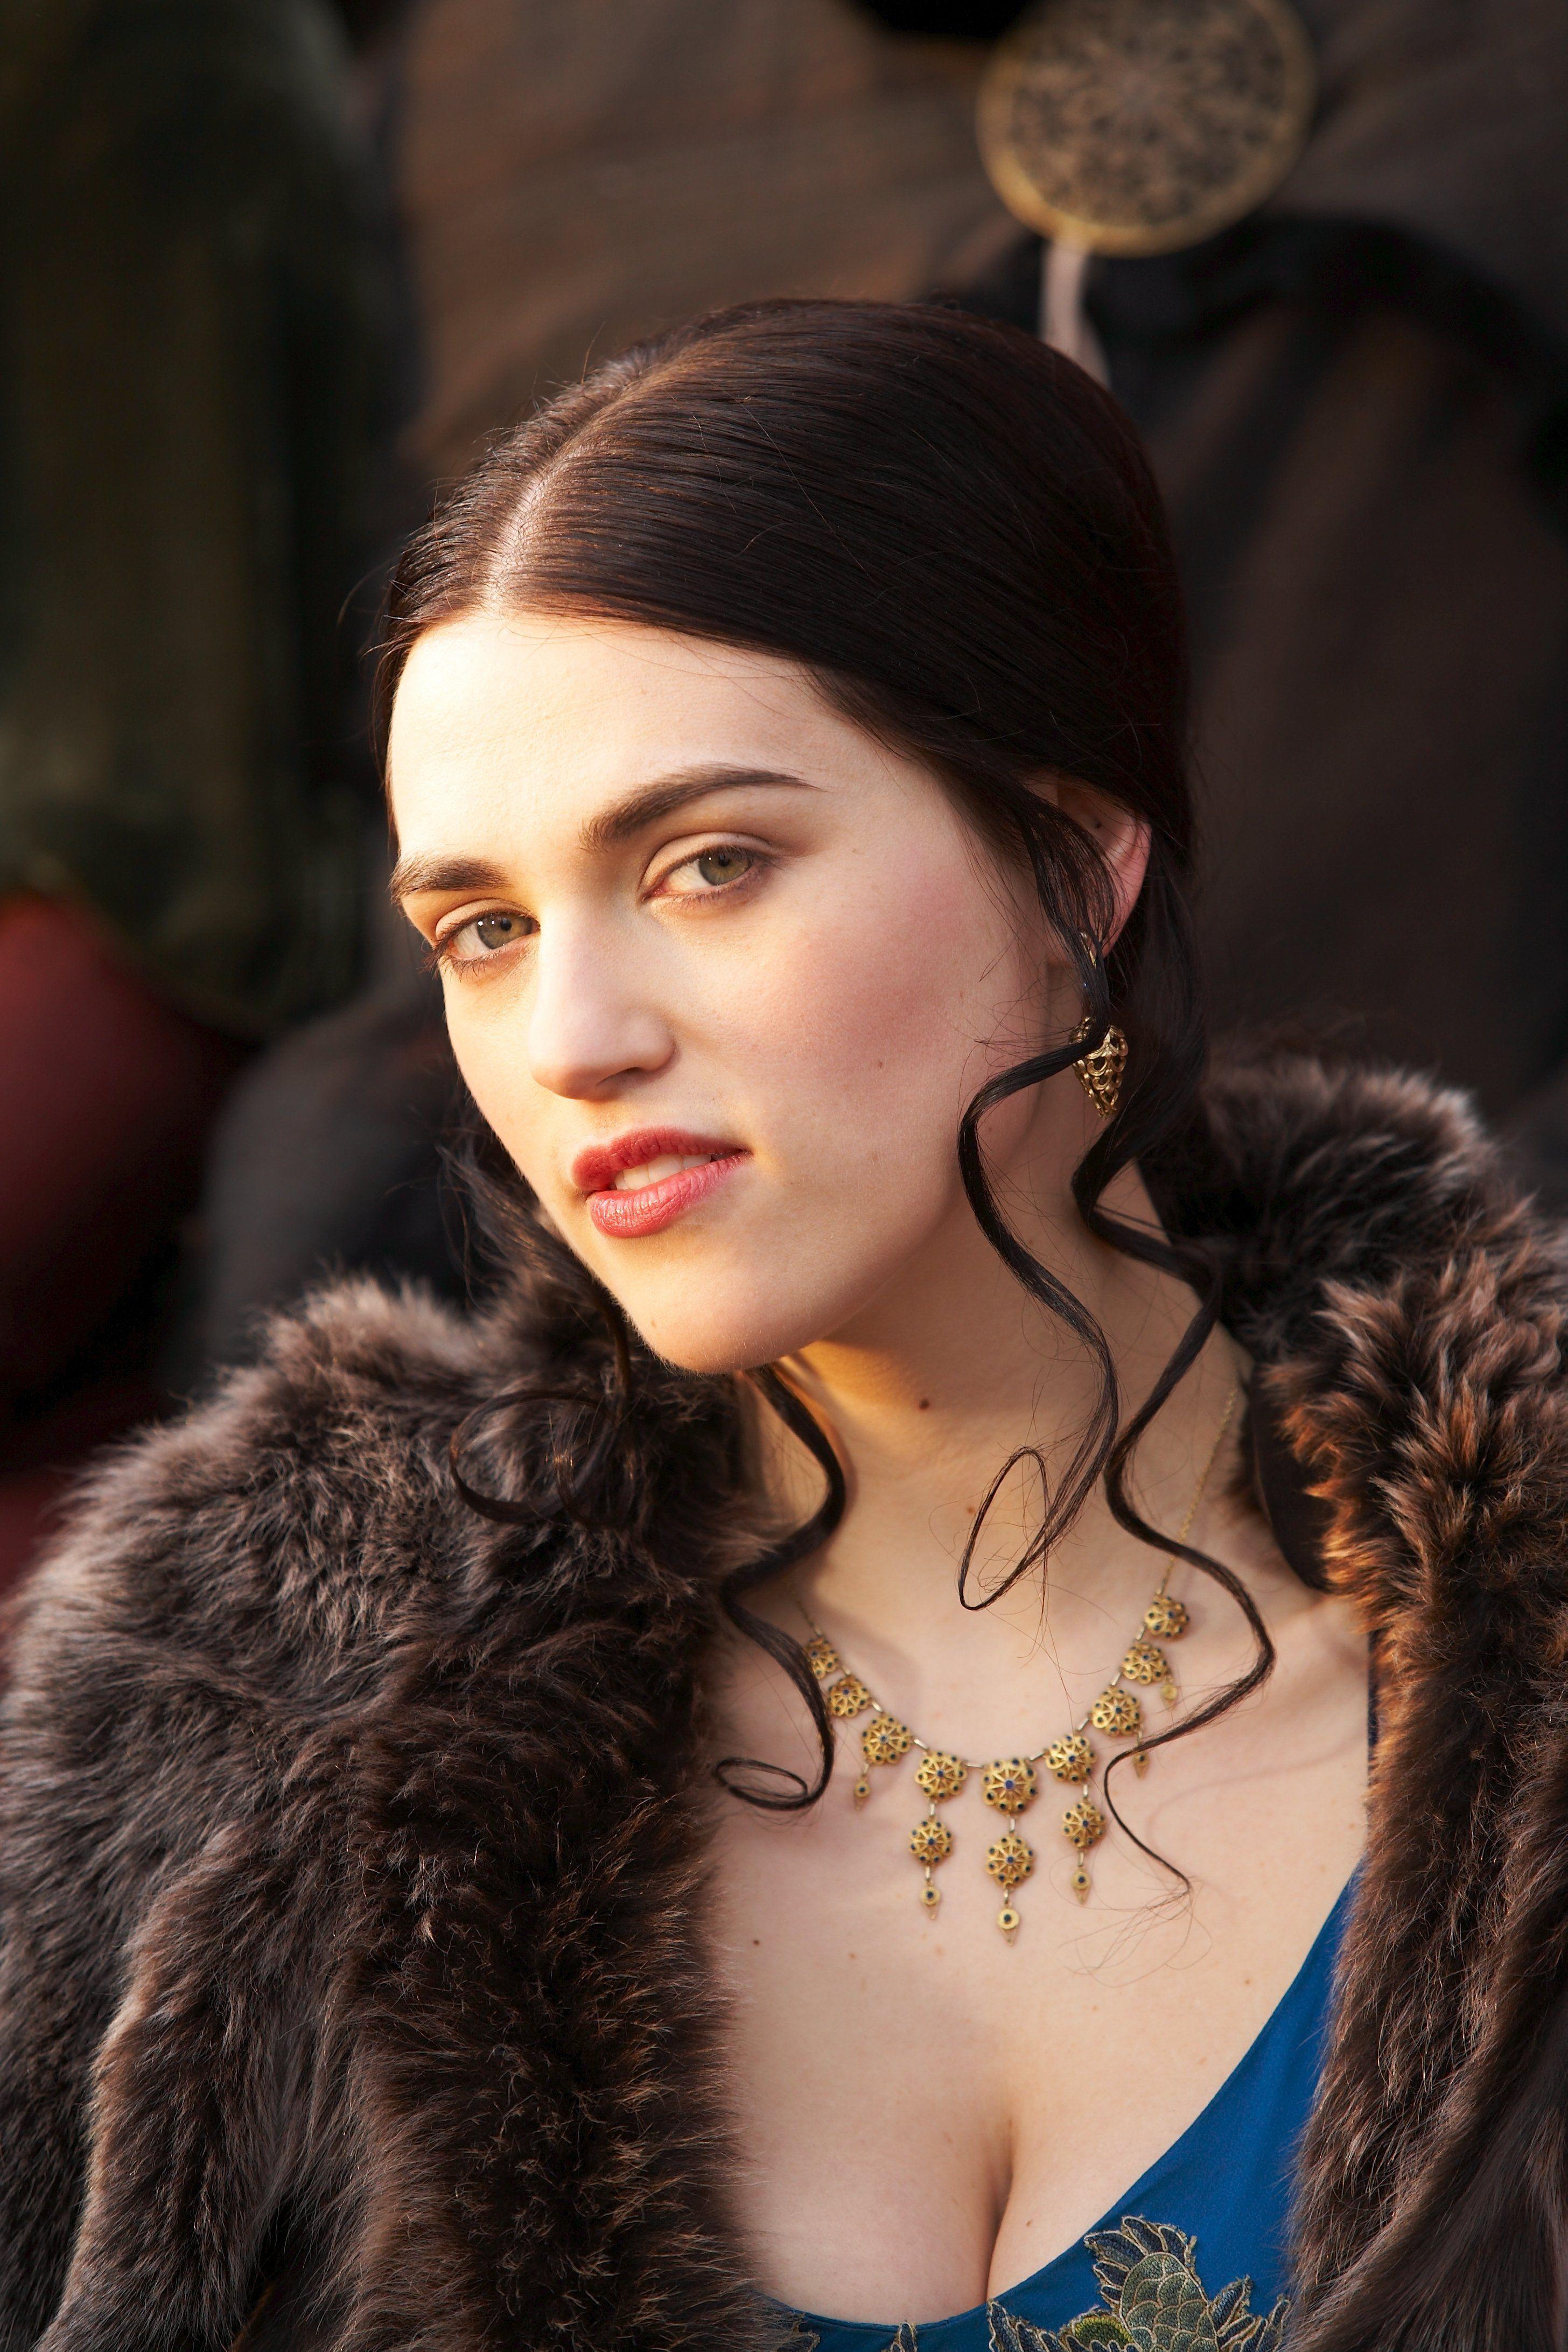 She is so gorgeous. | Katie mcgrath, Merlin morgana, Merlin